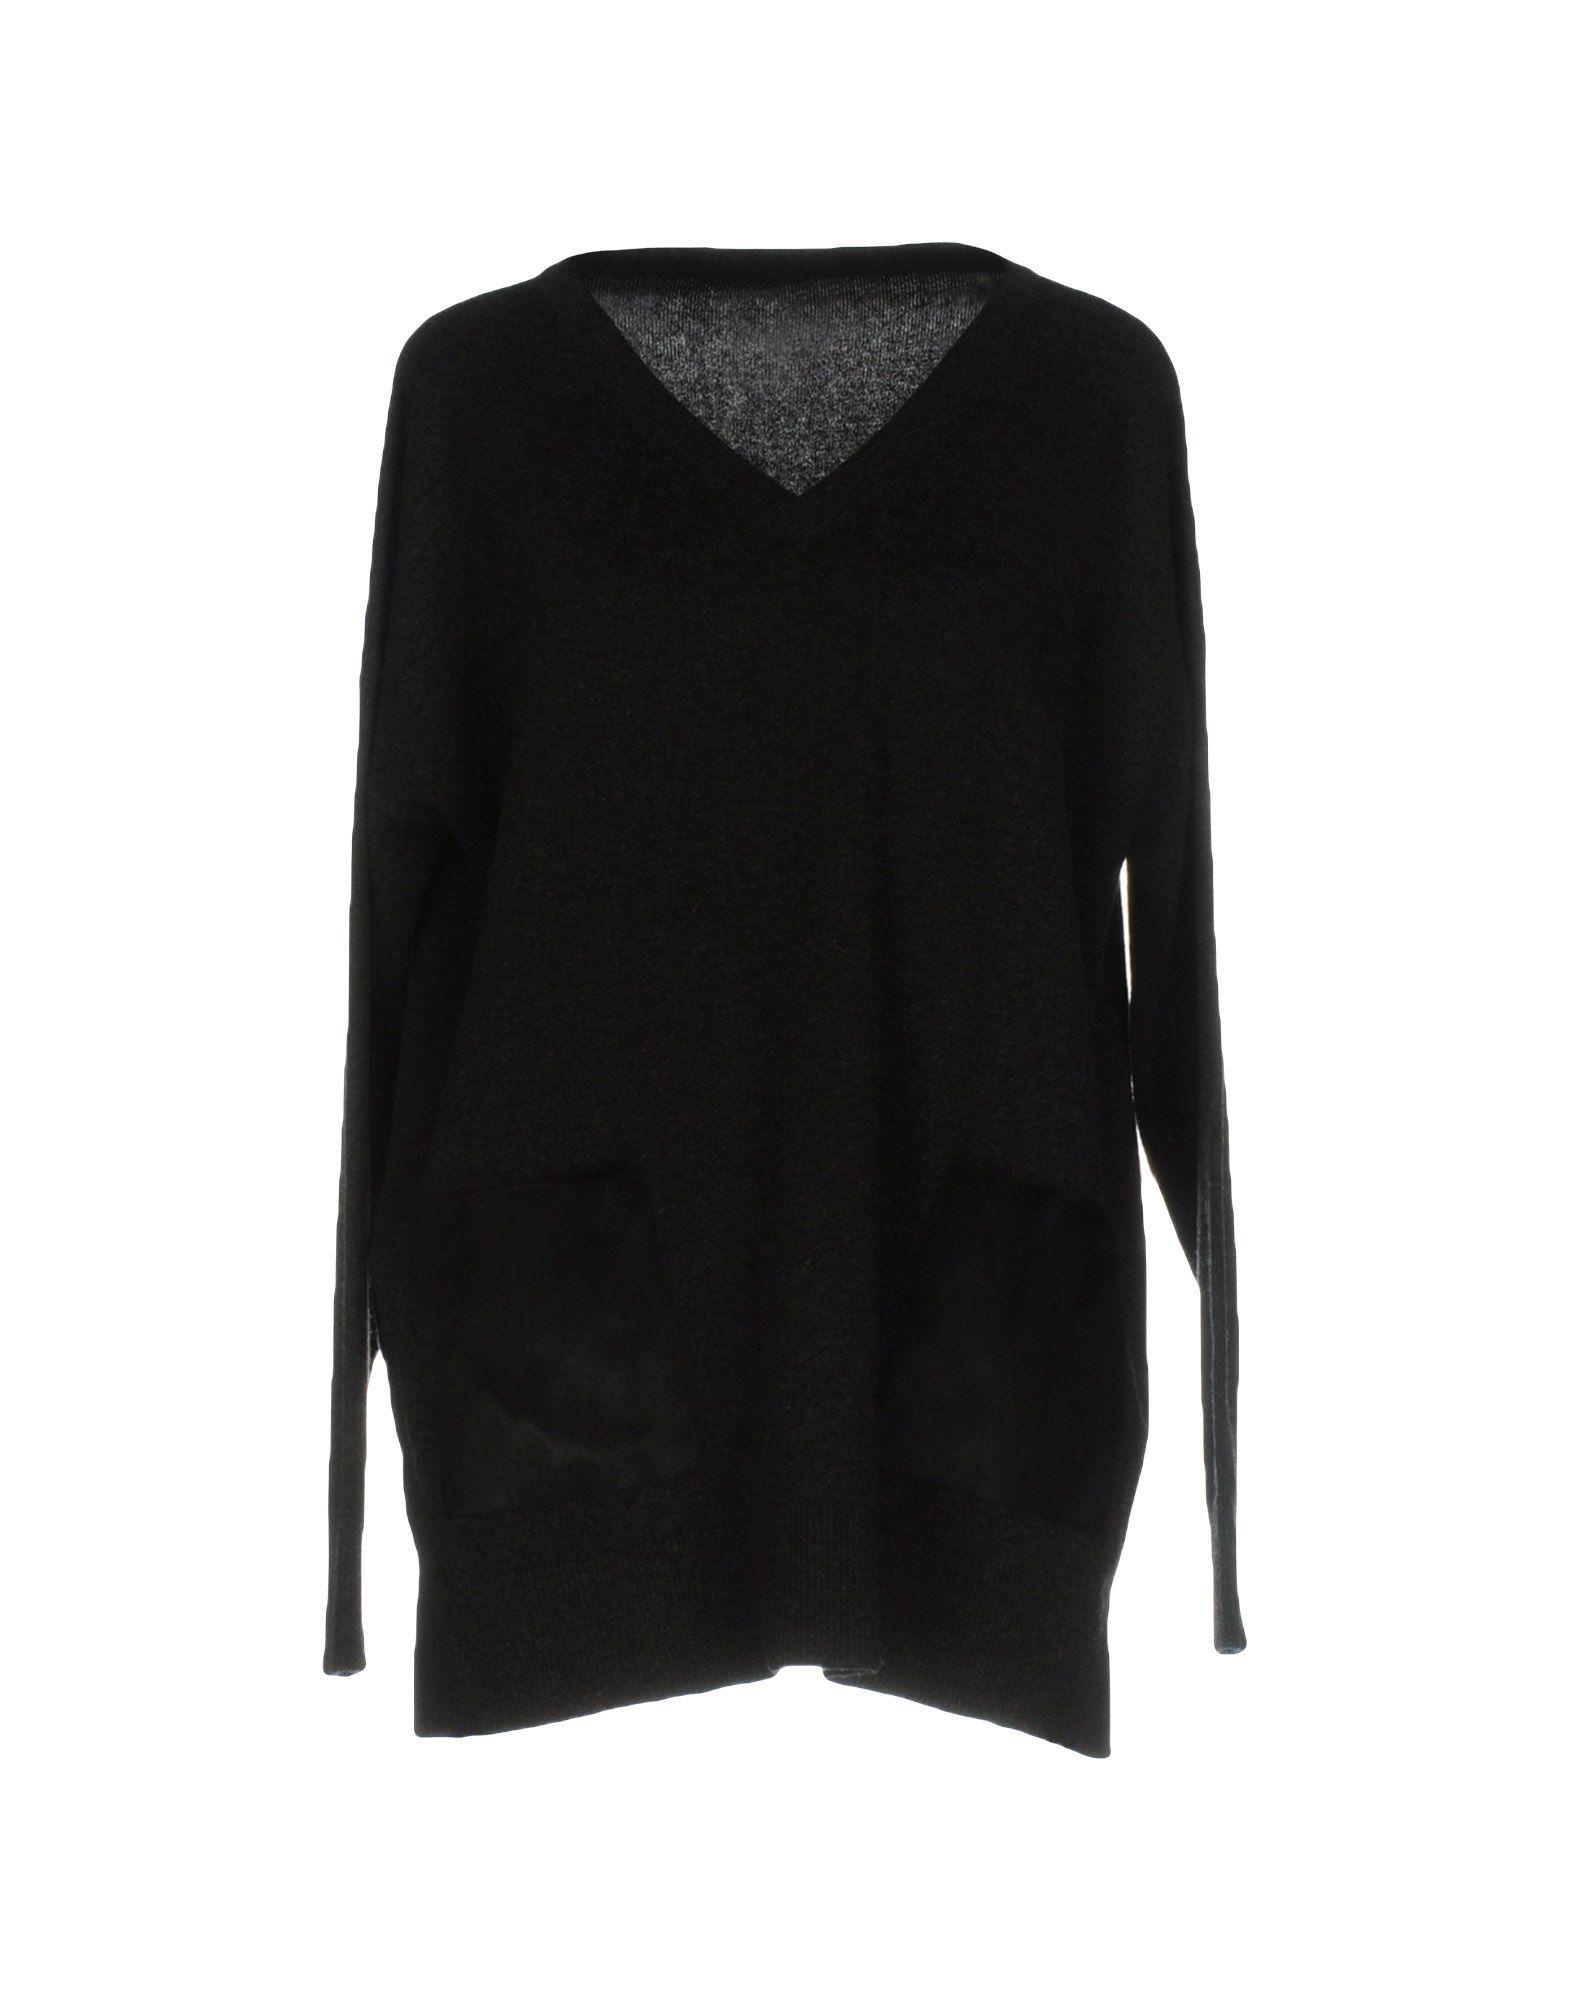 MICHAEL KORS COLLECTION Свитер свитер pettli collection pettli collection pe034ewvvz25